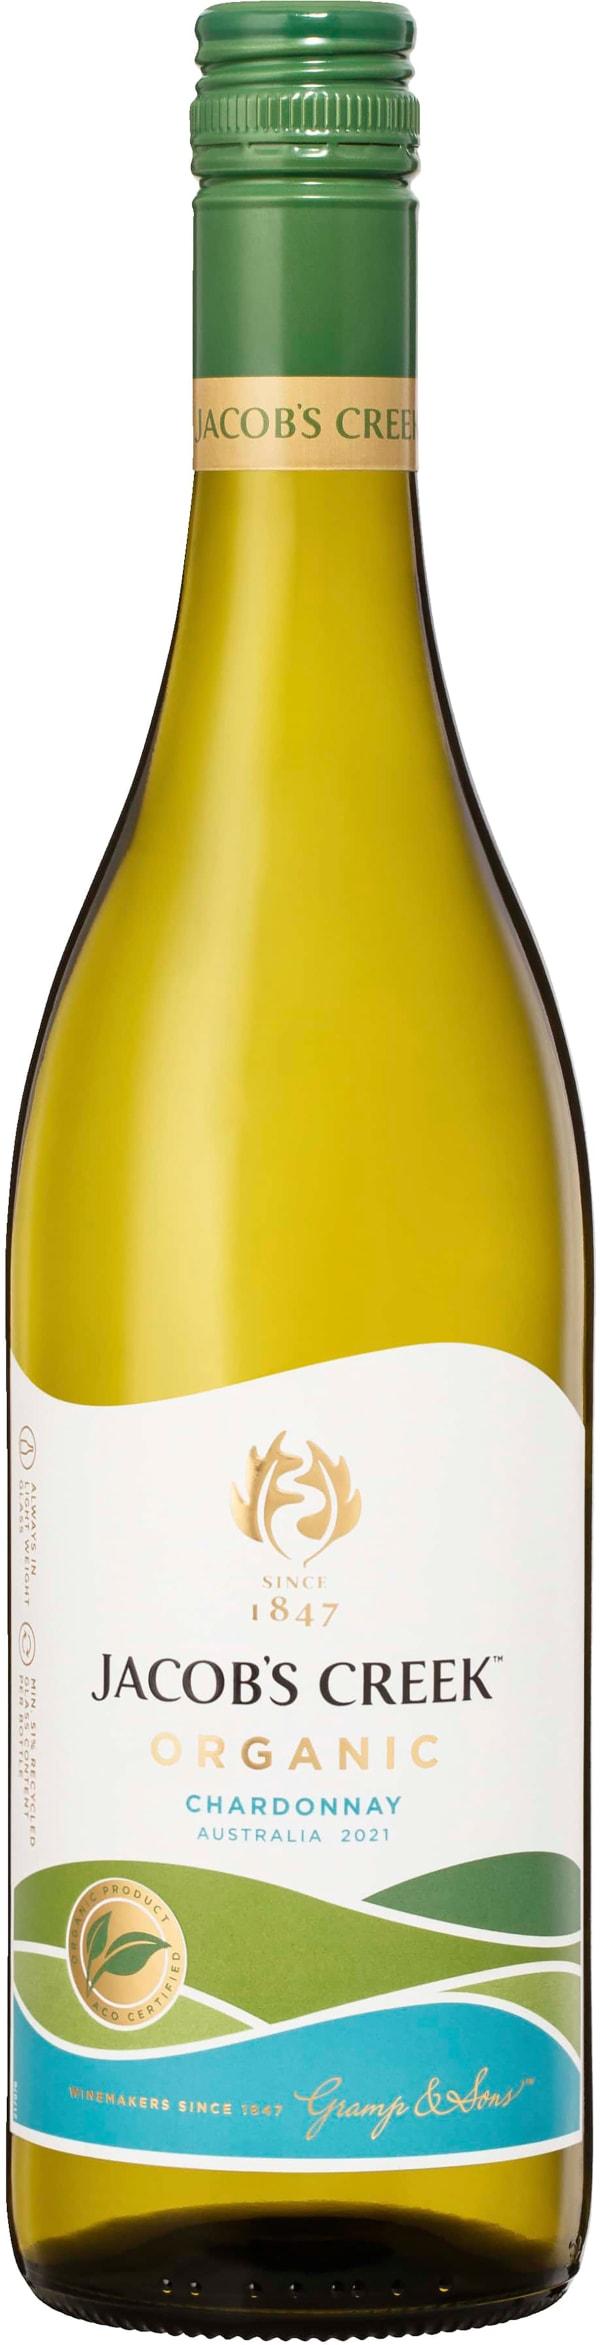 Jacob's Creek Organic Chardonnay 2019